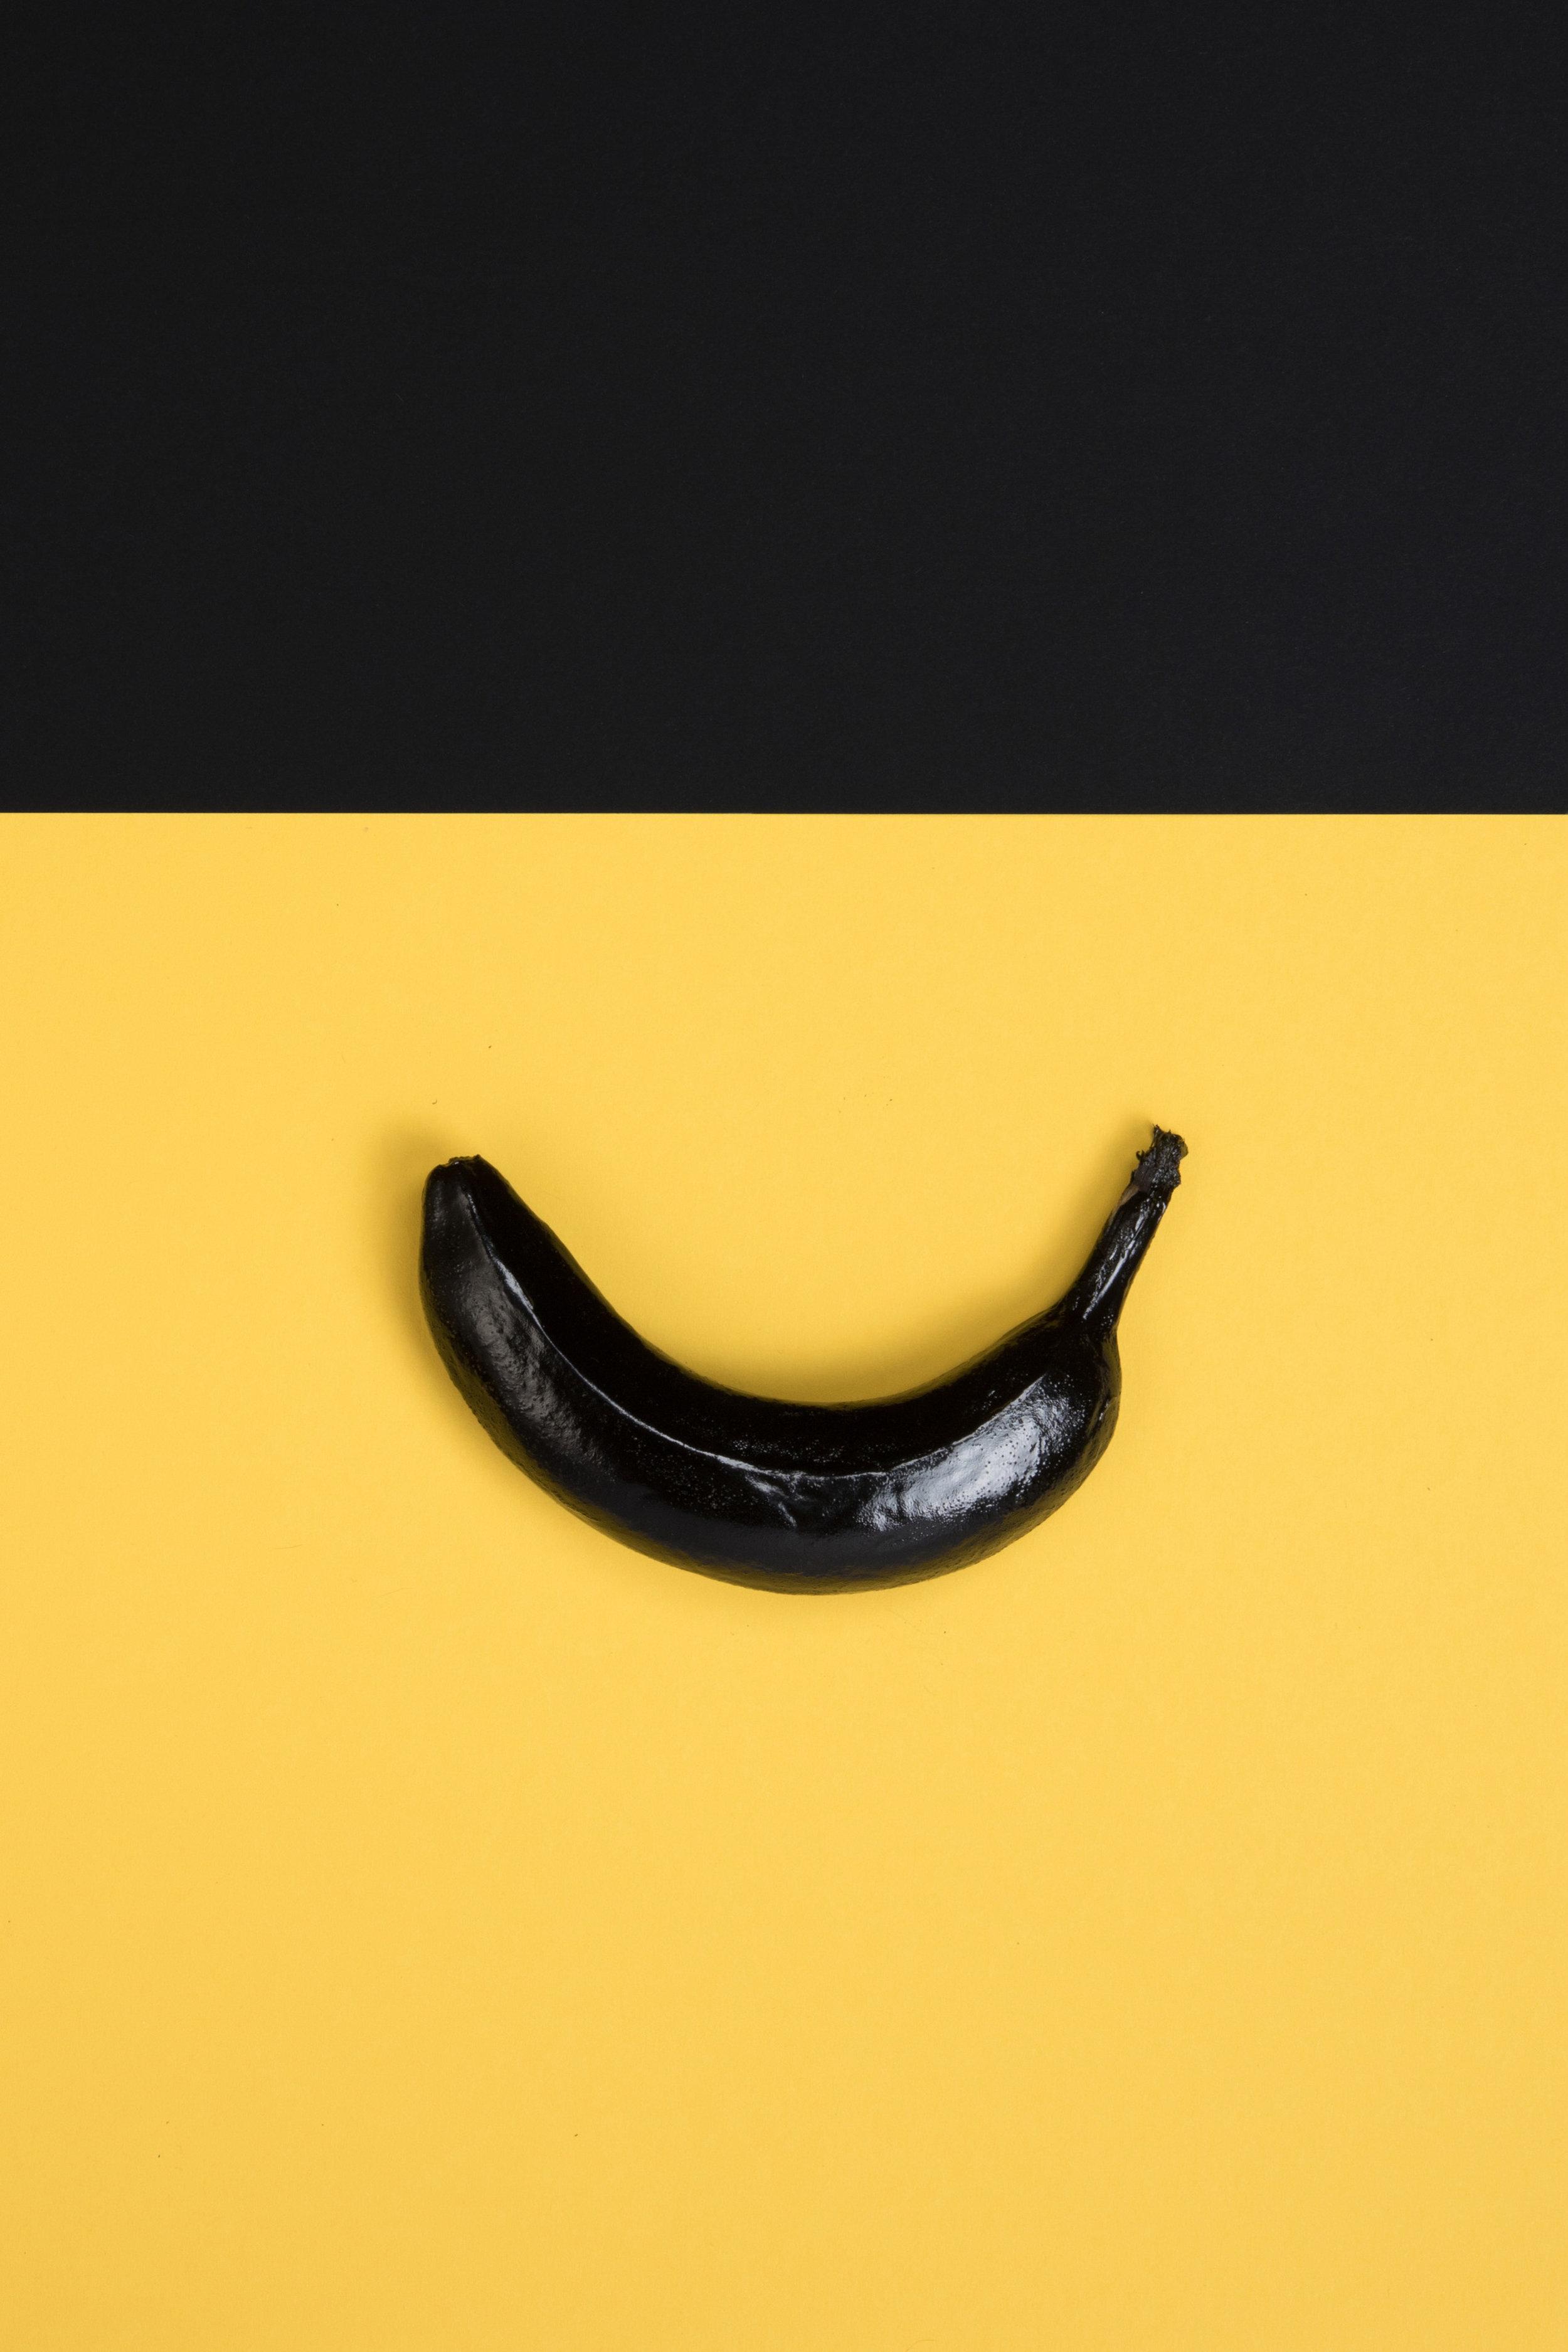 (6)4-20170929_Bananas-2556 2.jpg